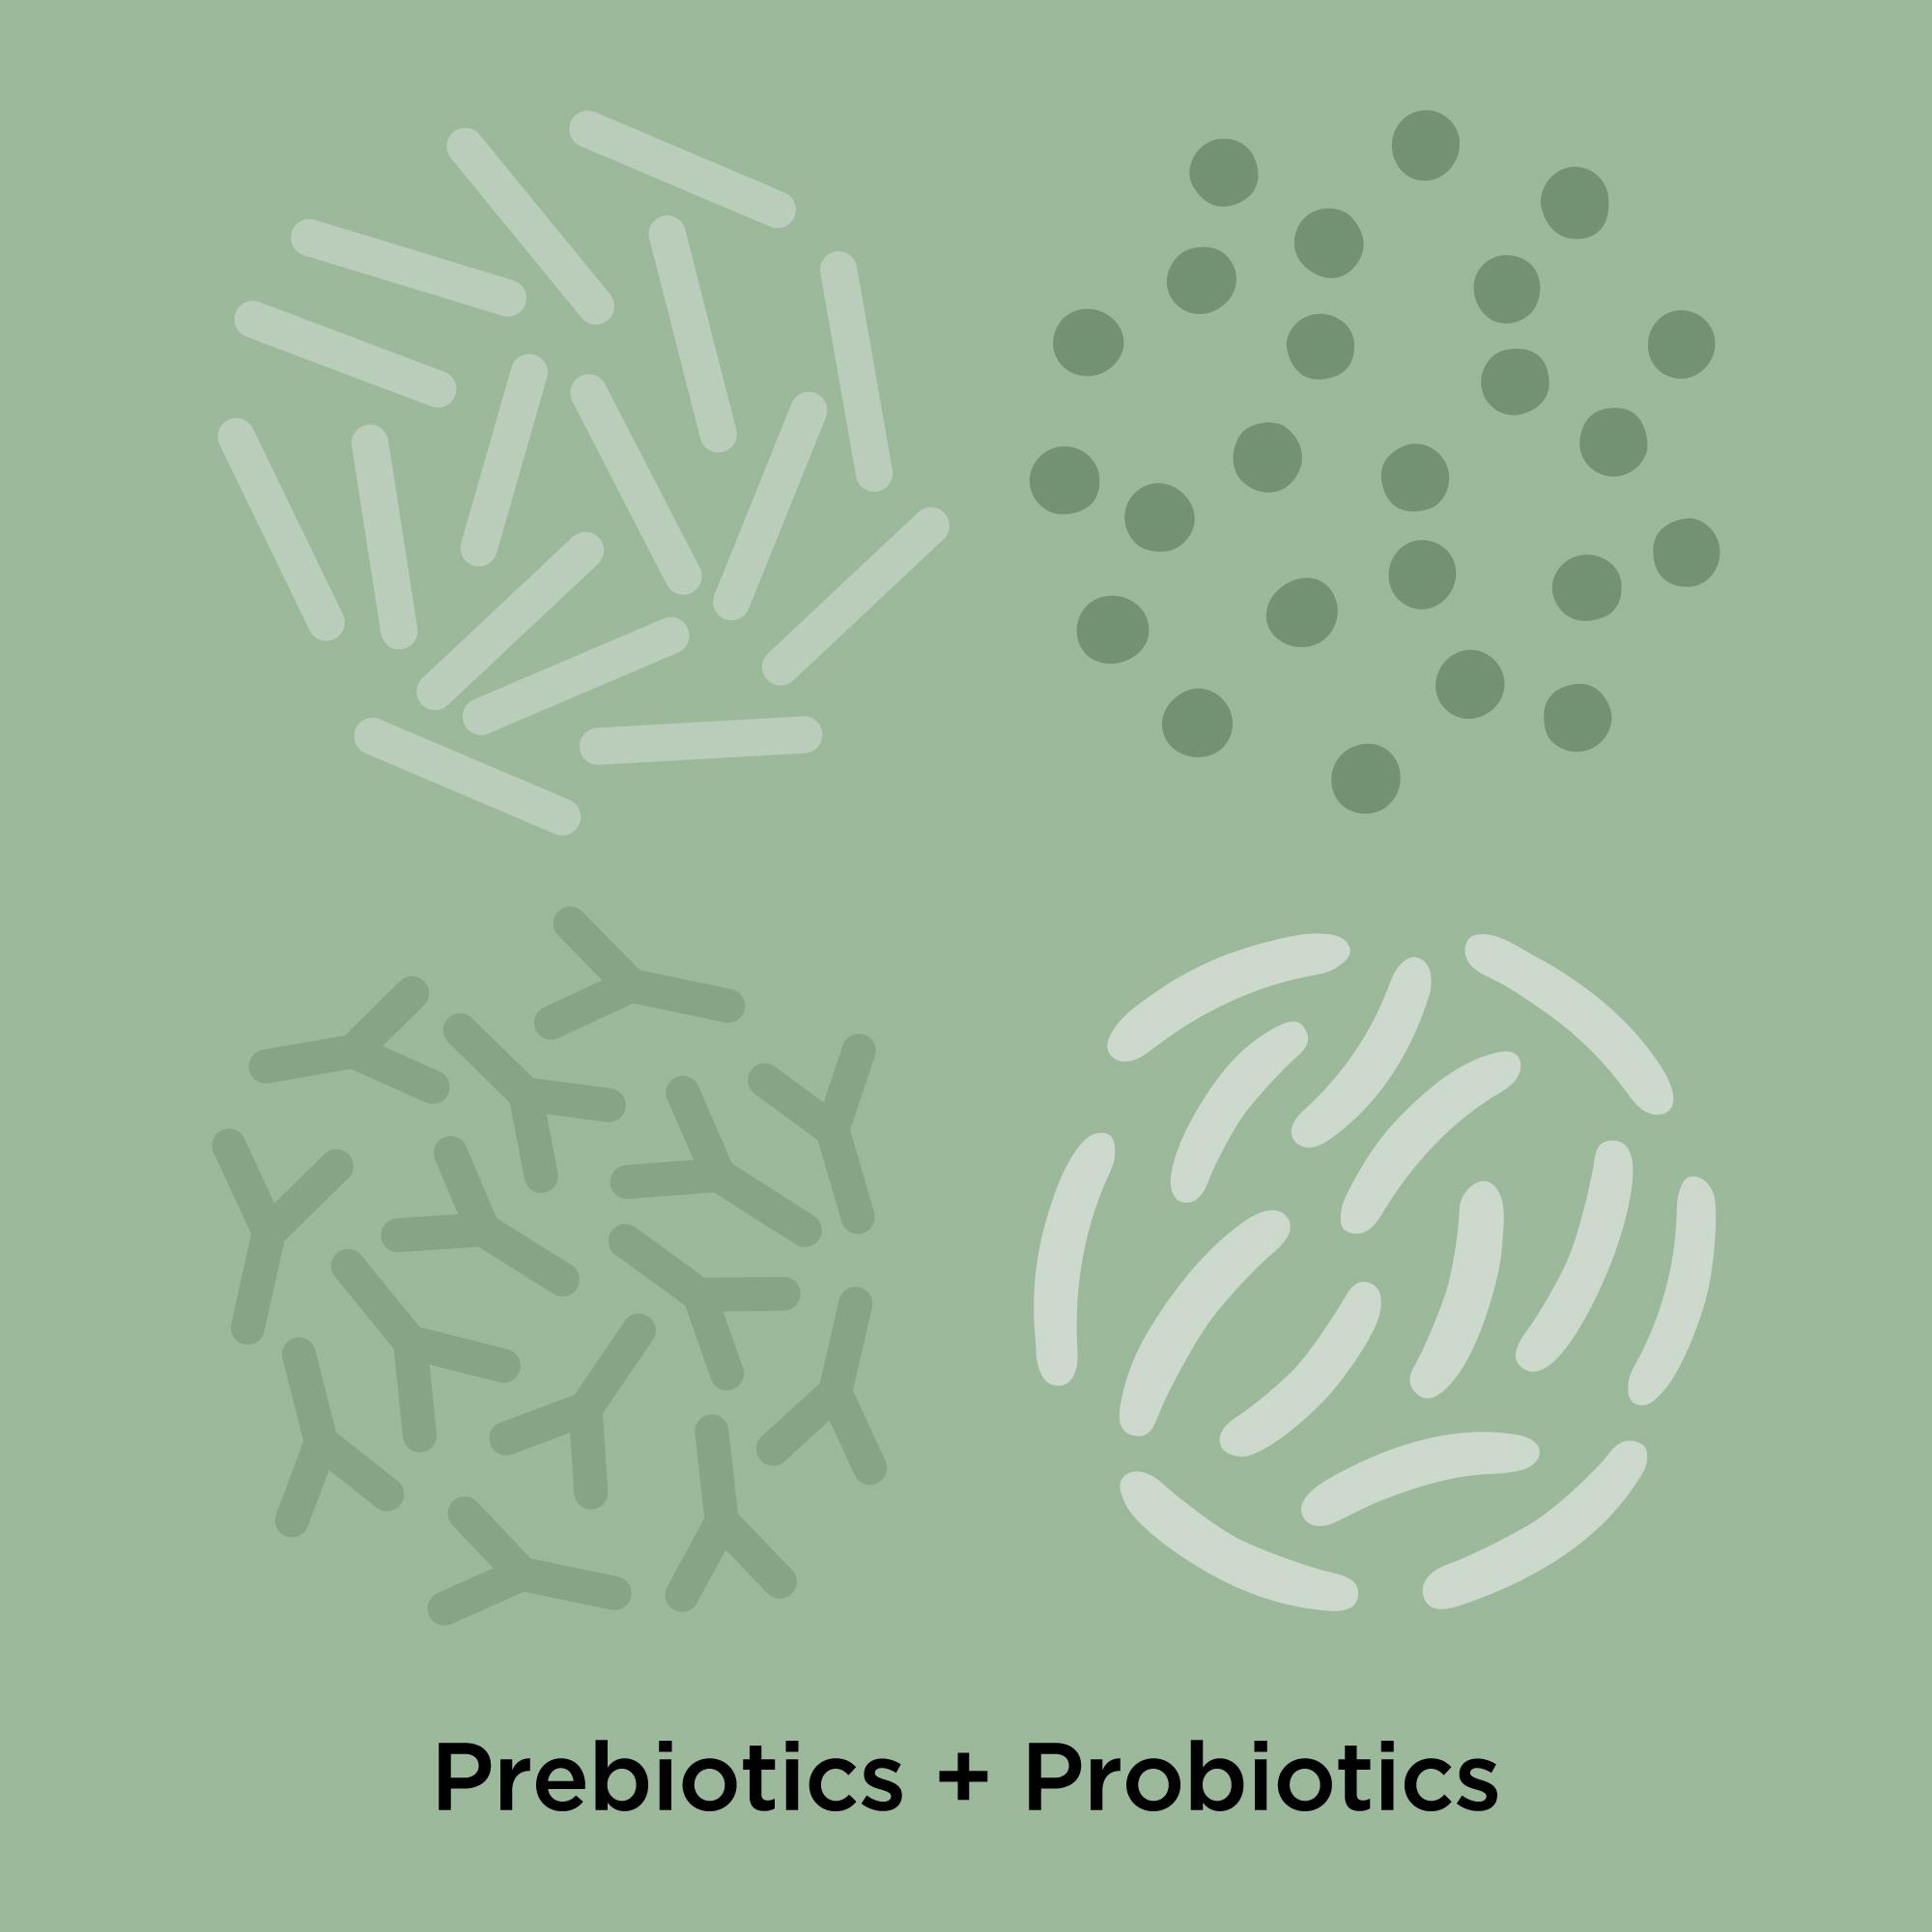 Superstart Cleanser contains prebiotics and probiotics.